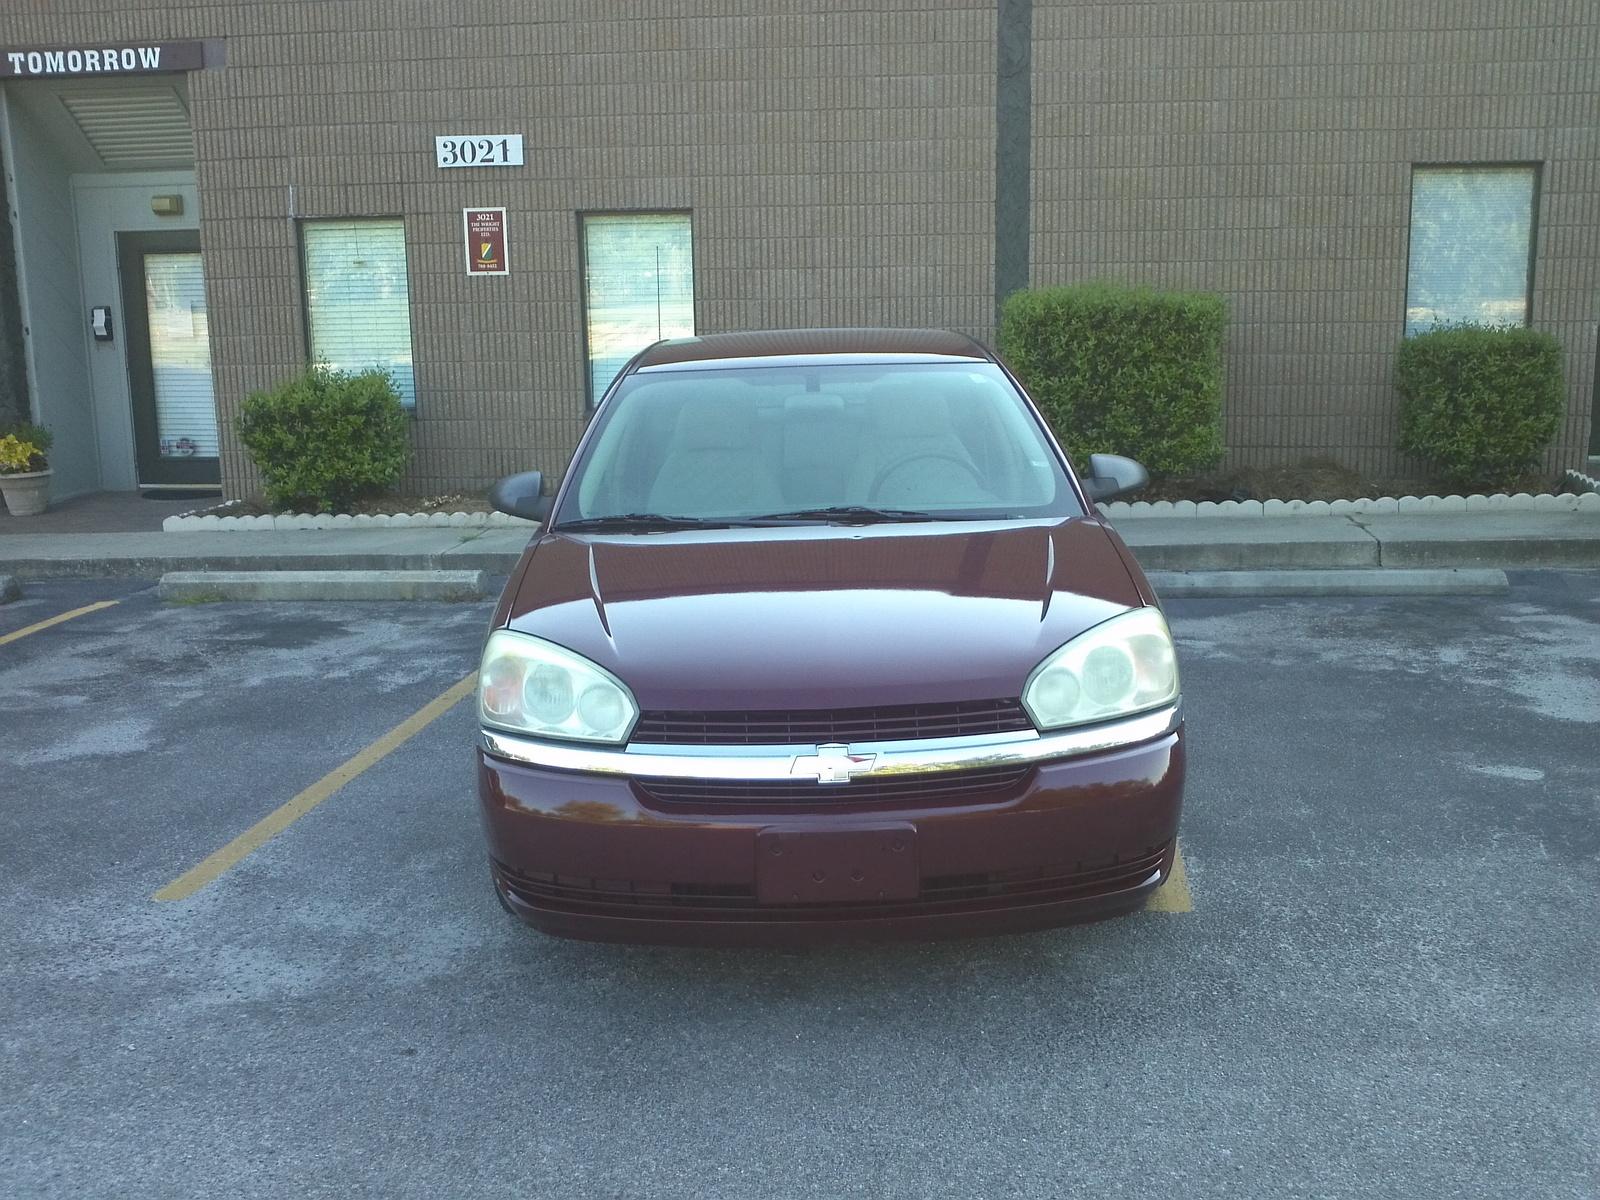 Used Chevy Trax Murray >> 2005 Chevrolet Malibu Maxx - Overview - CarGurus